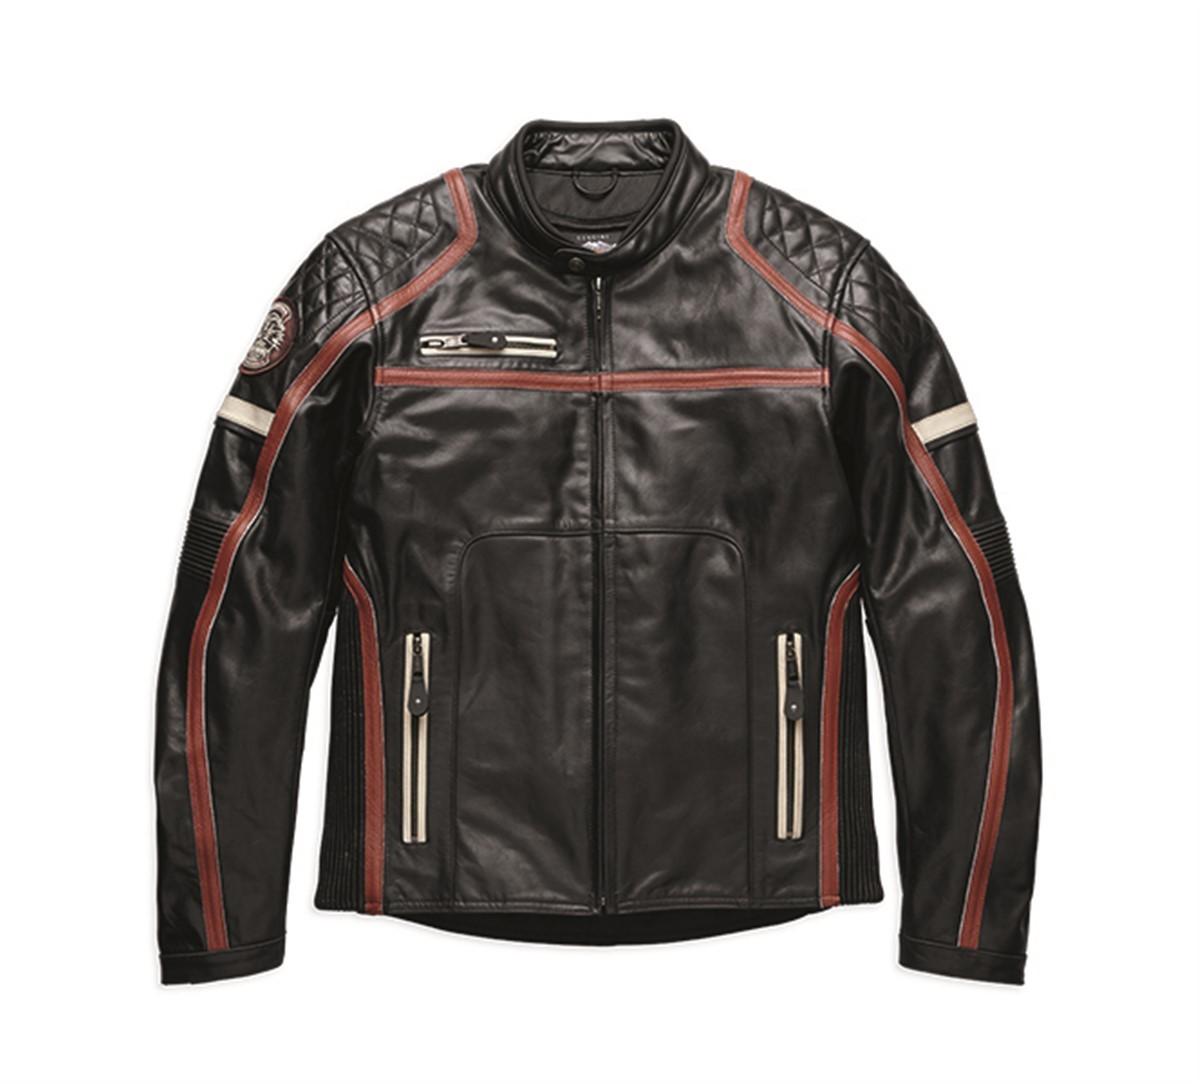 55e04b37b0d Chaqueta Harley-Davidson Maytor Leather CE